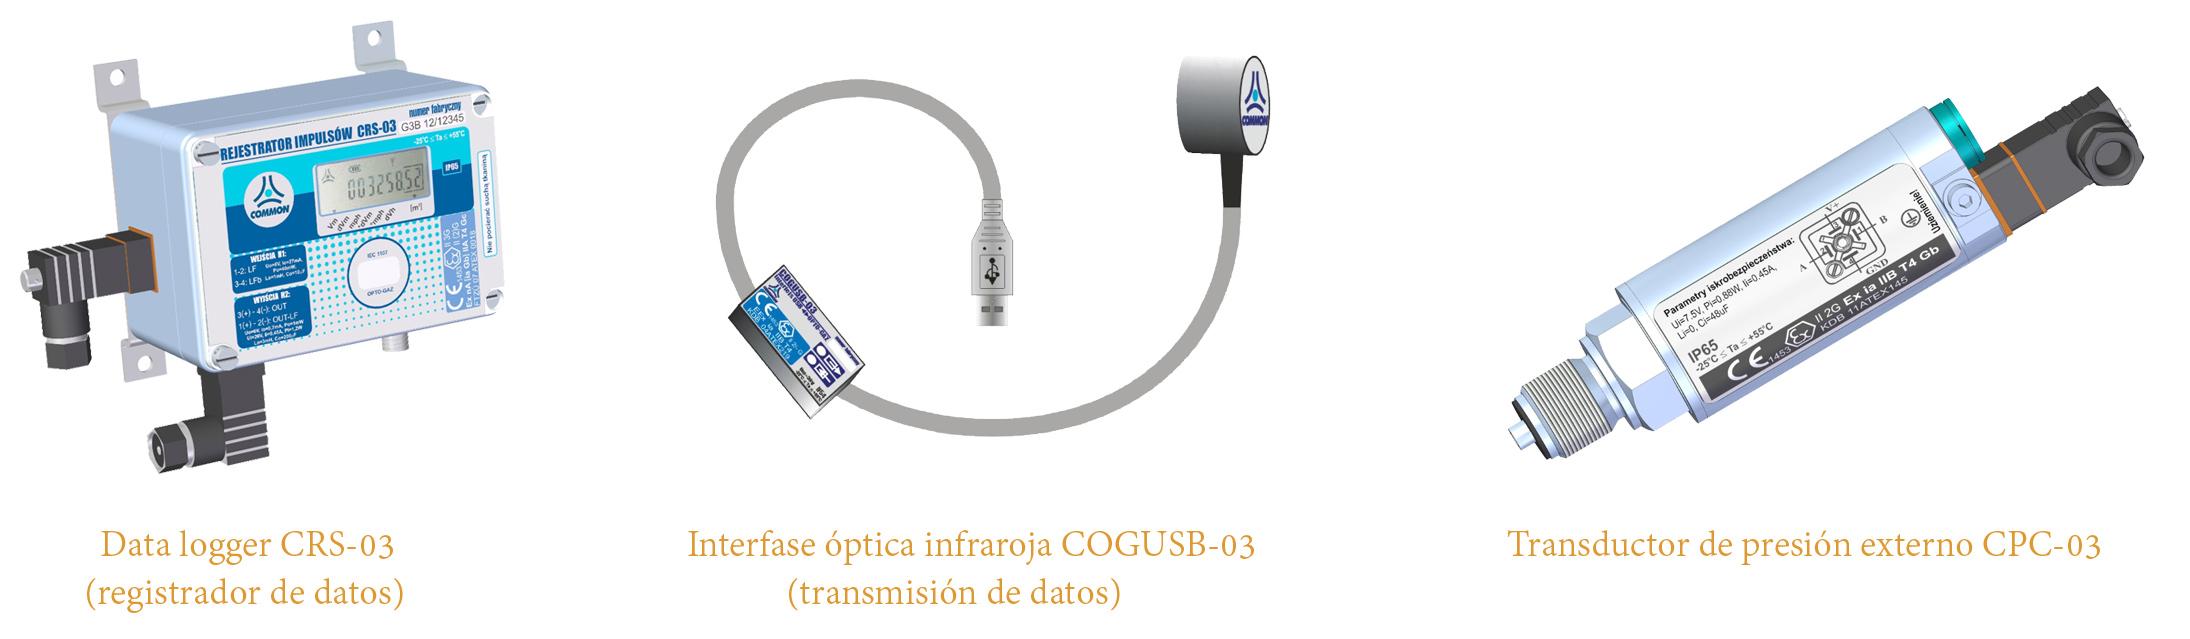 Data-logger-CRS-03_Interfase-optica-infraroja-COGUSB-03